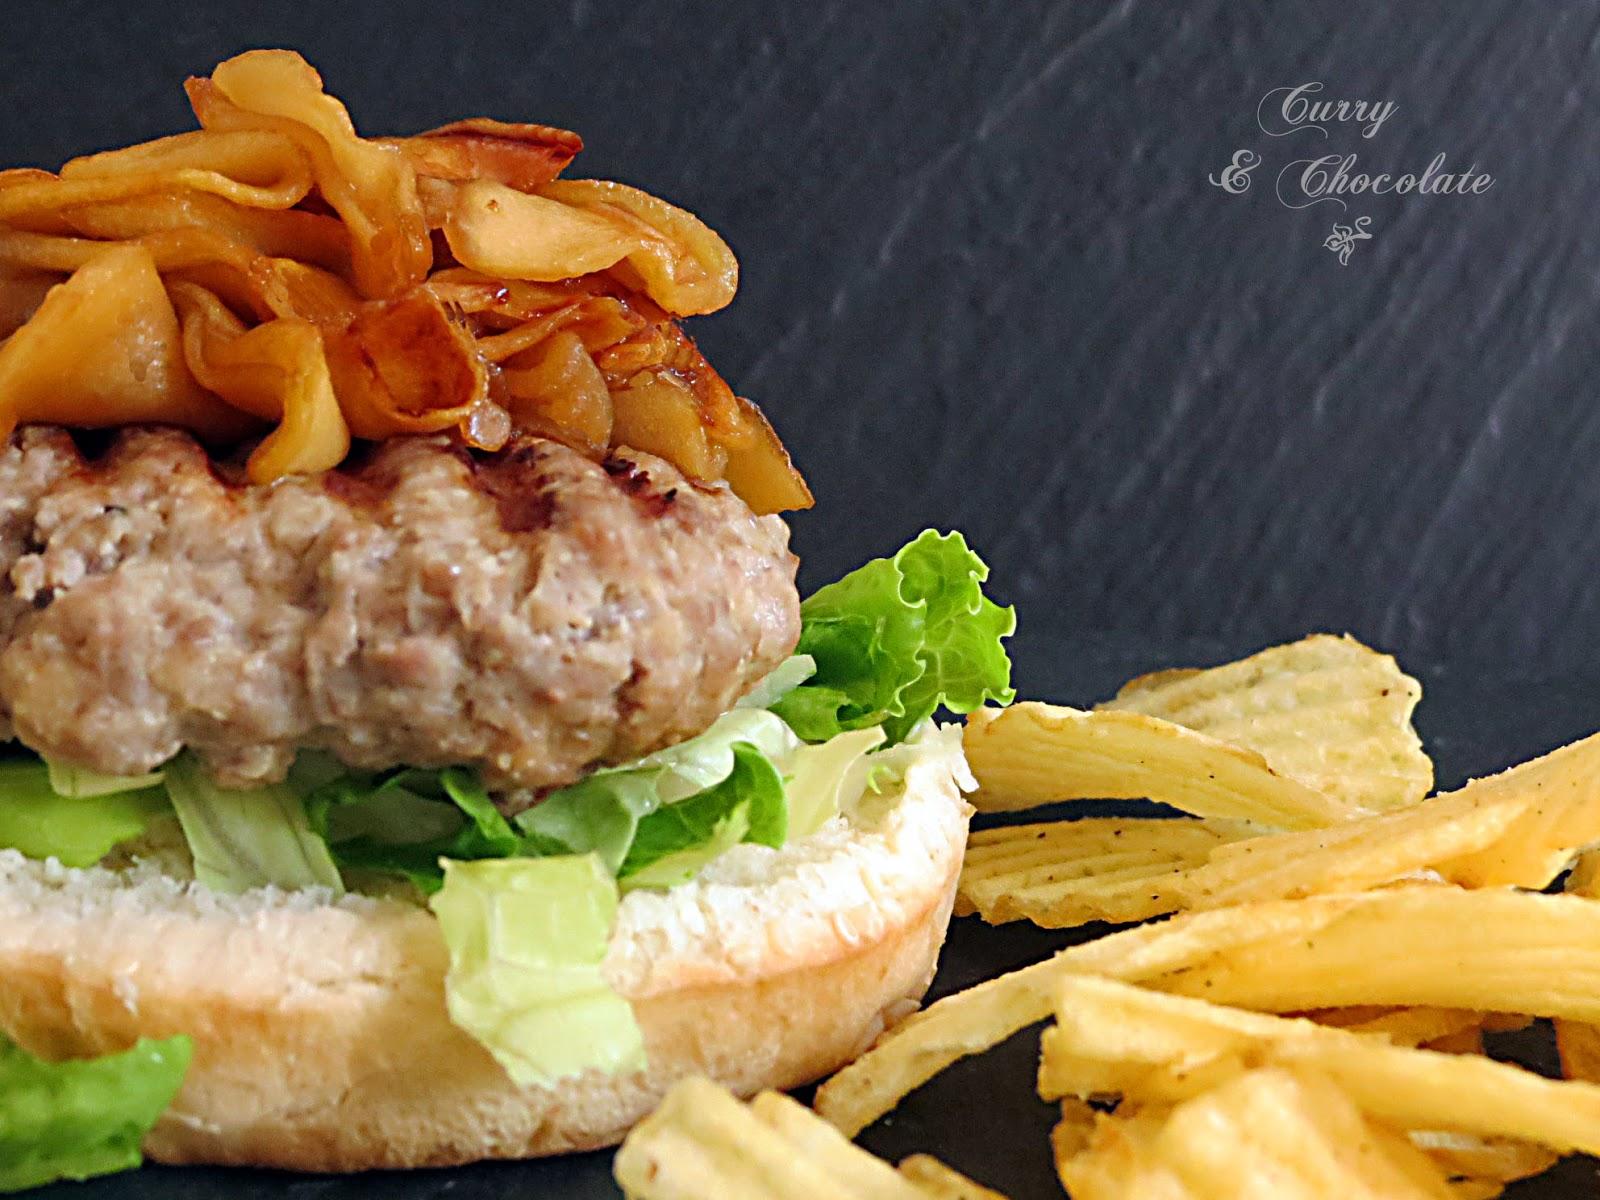 Hamburguesas de ternera con manzana caramelizada y salsa de gorgonzola – Beef burgers with caramelized apple slices and gorgonzola sauce